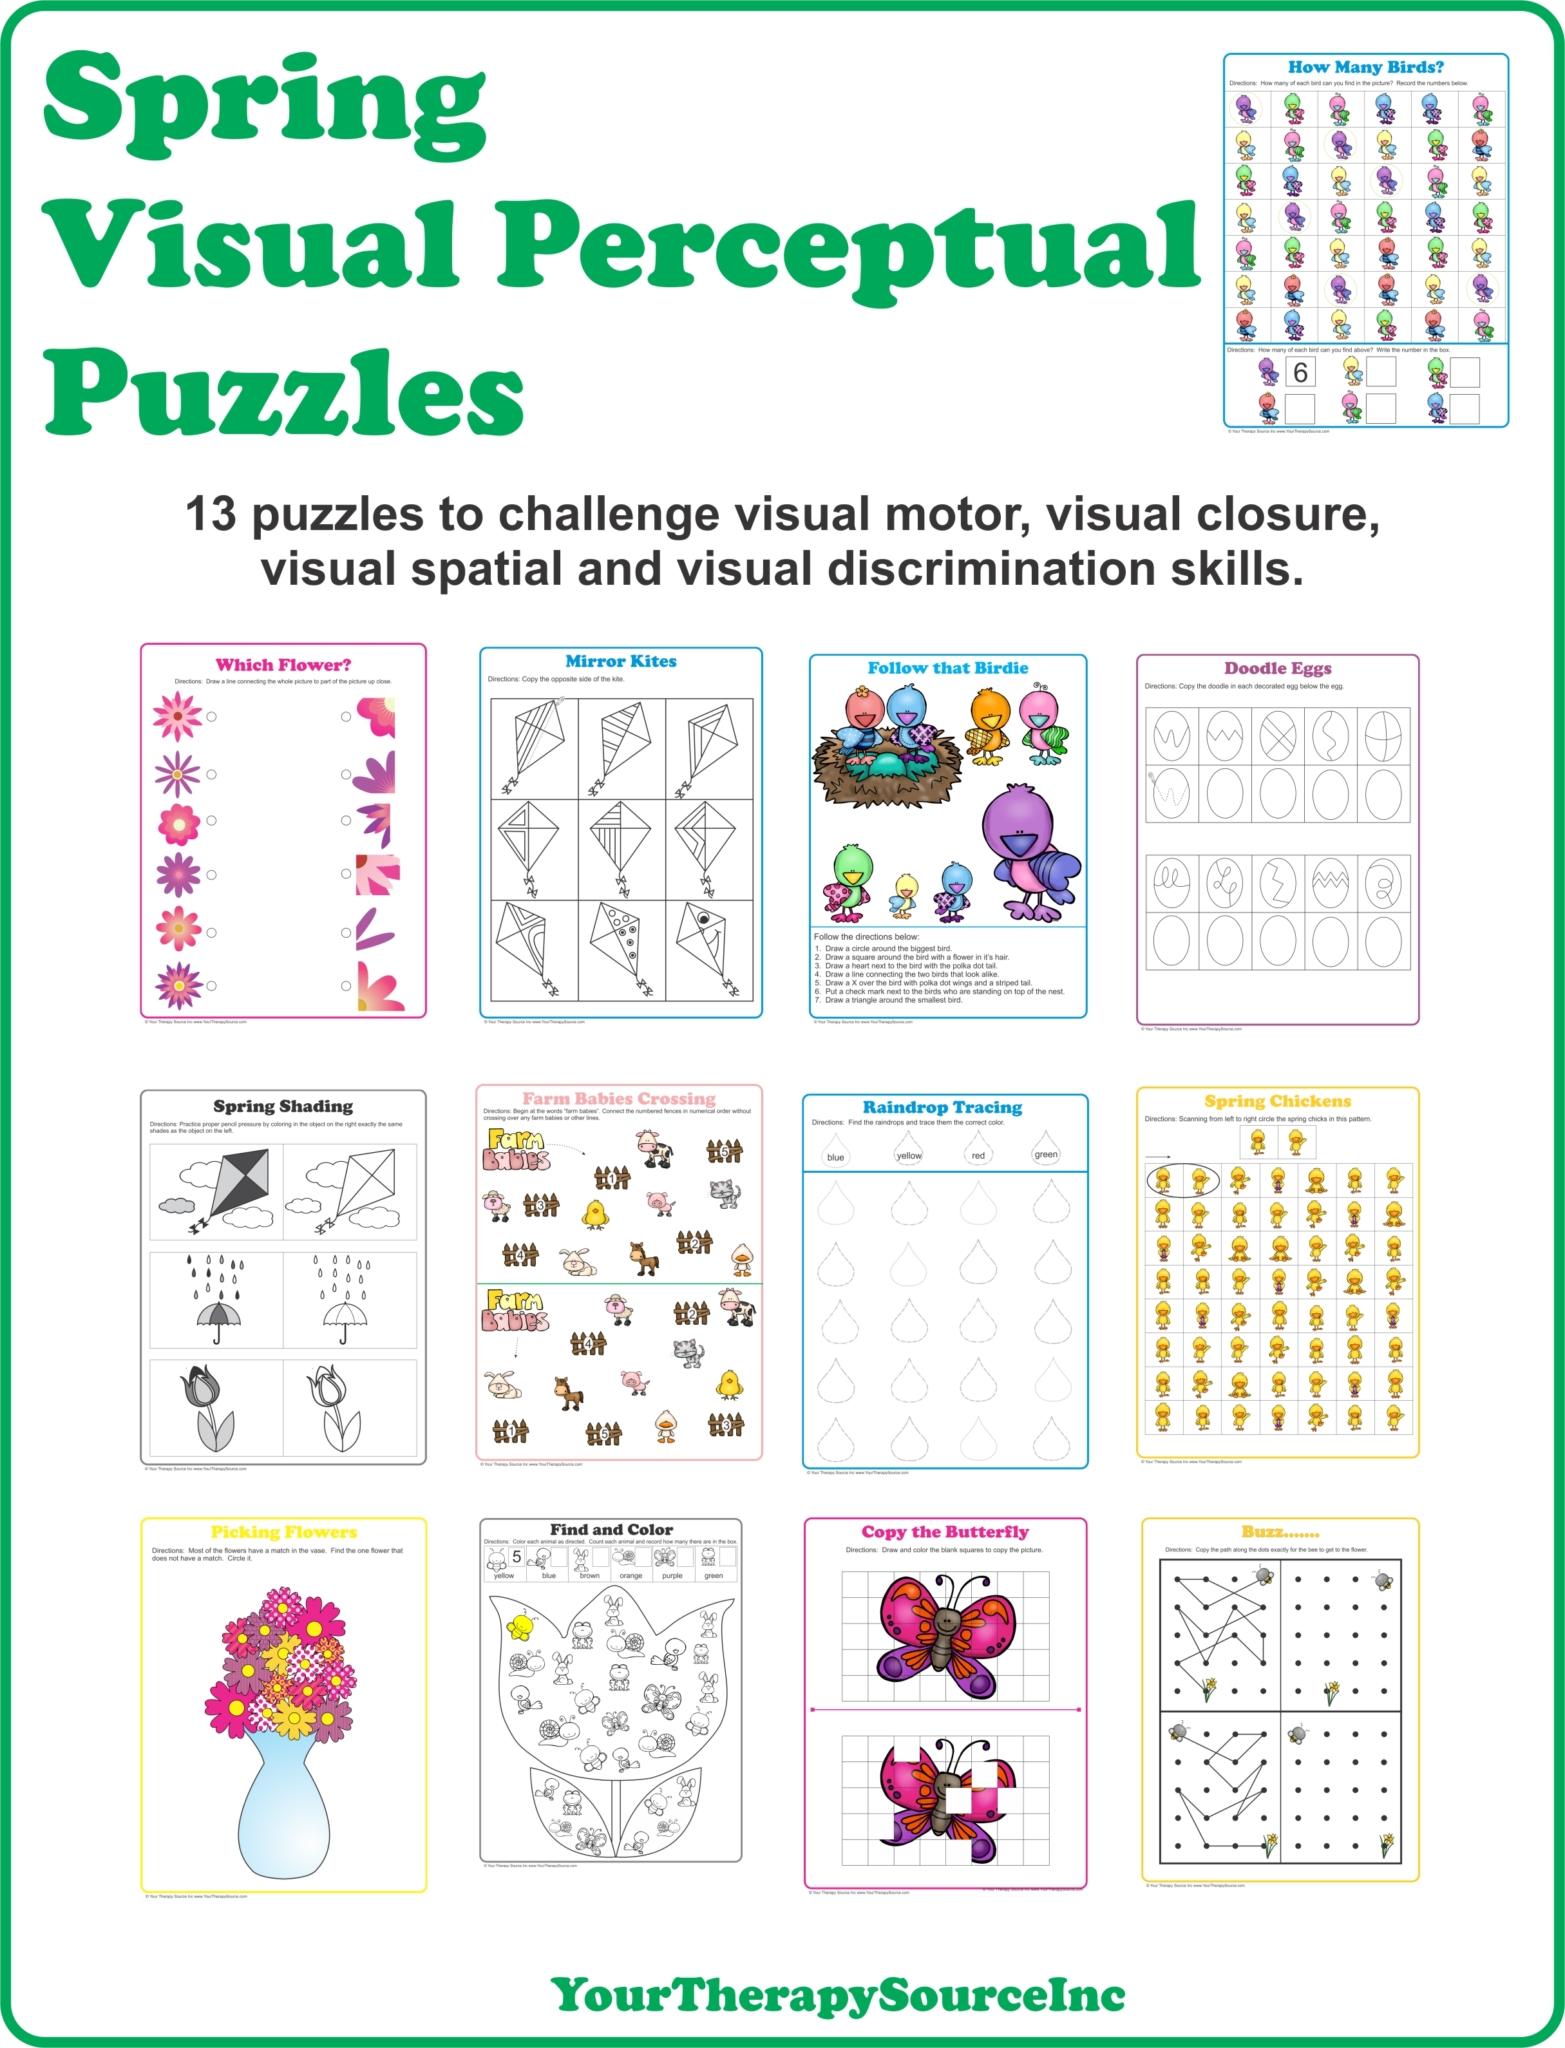 Spring Visual Perceptual Puzzles cover